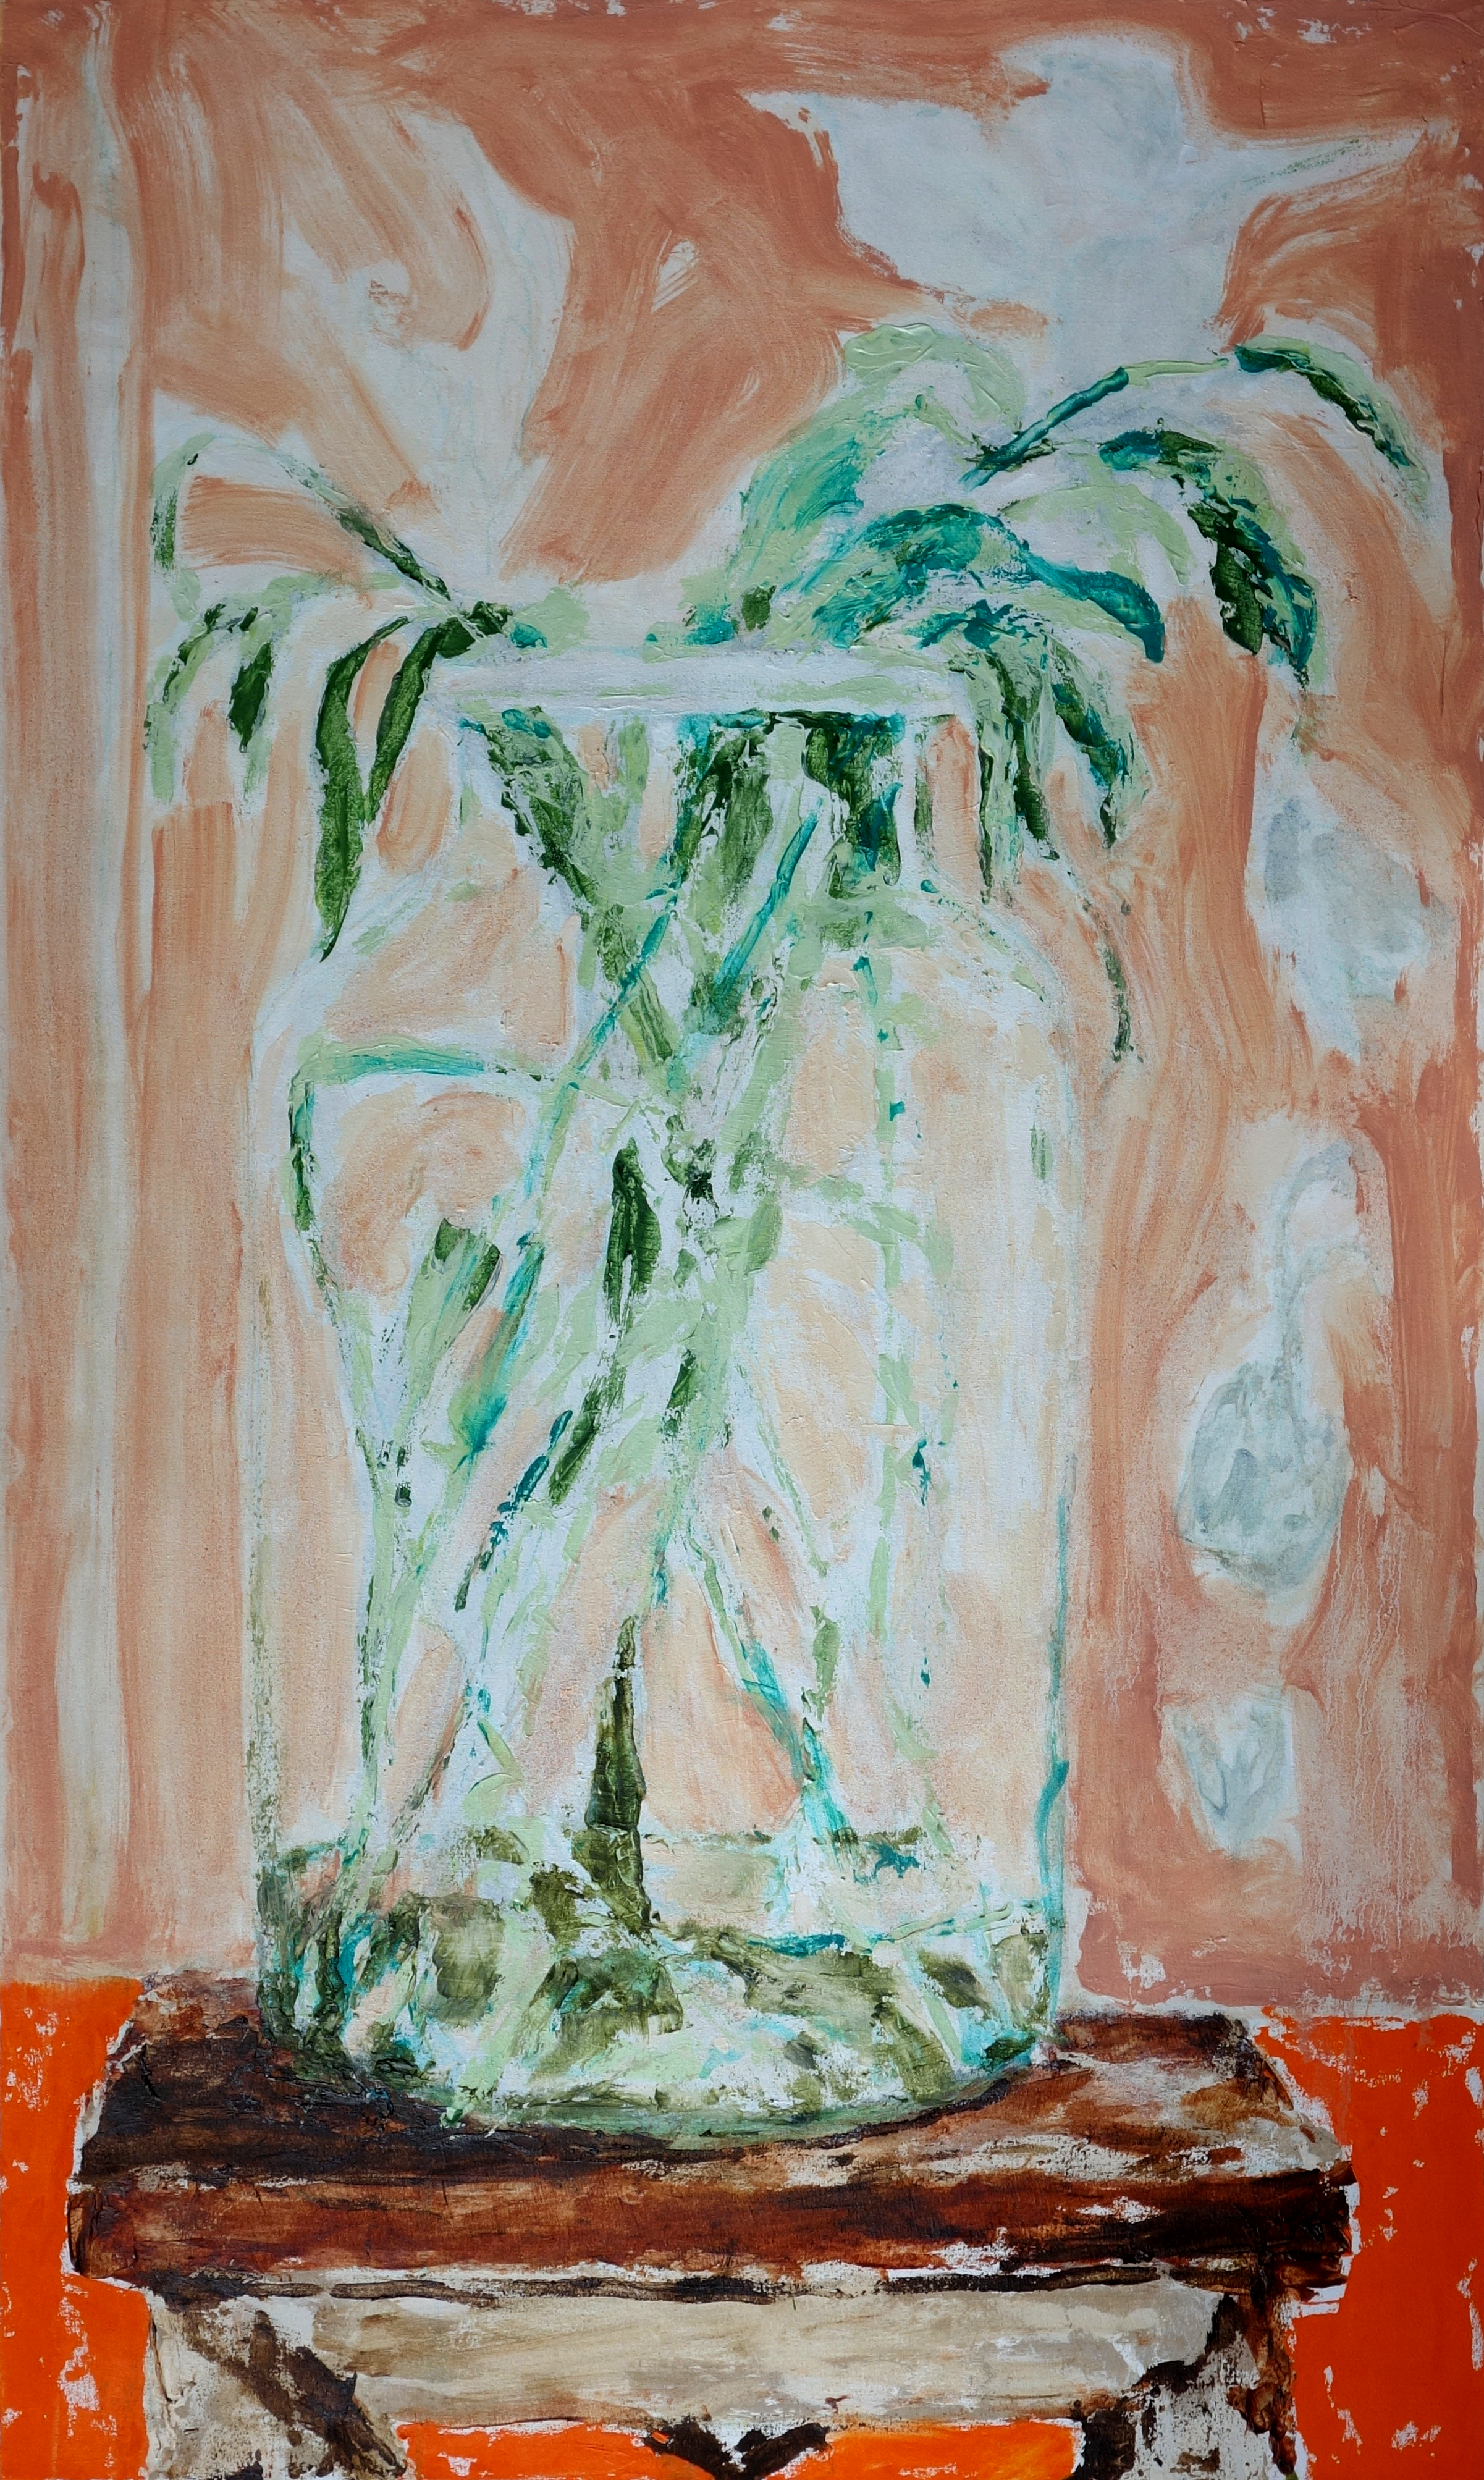 Green Energy, Oil on Canvas